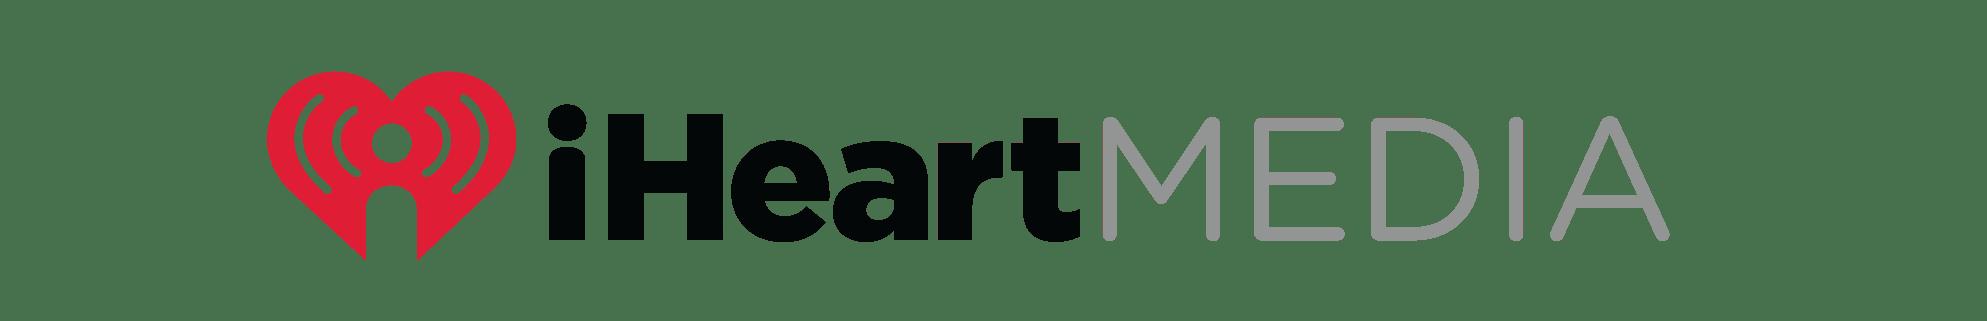 Union-Color-logo-w300.jpg